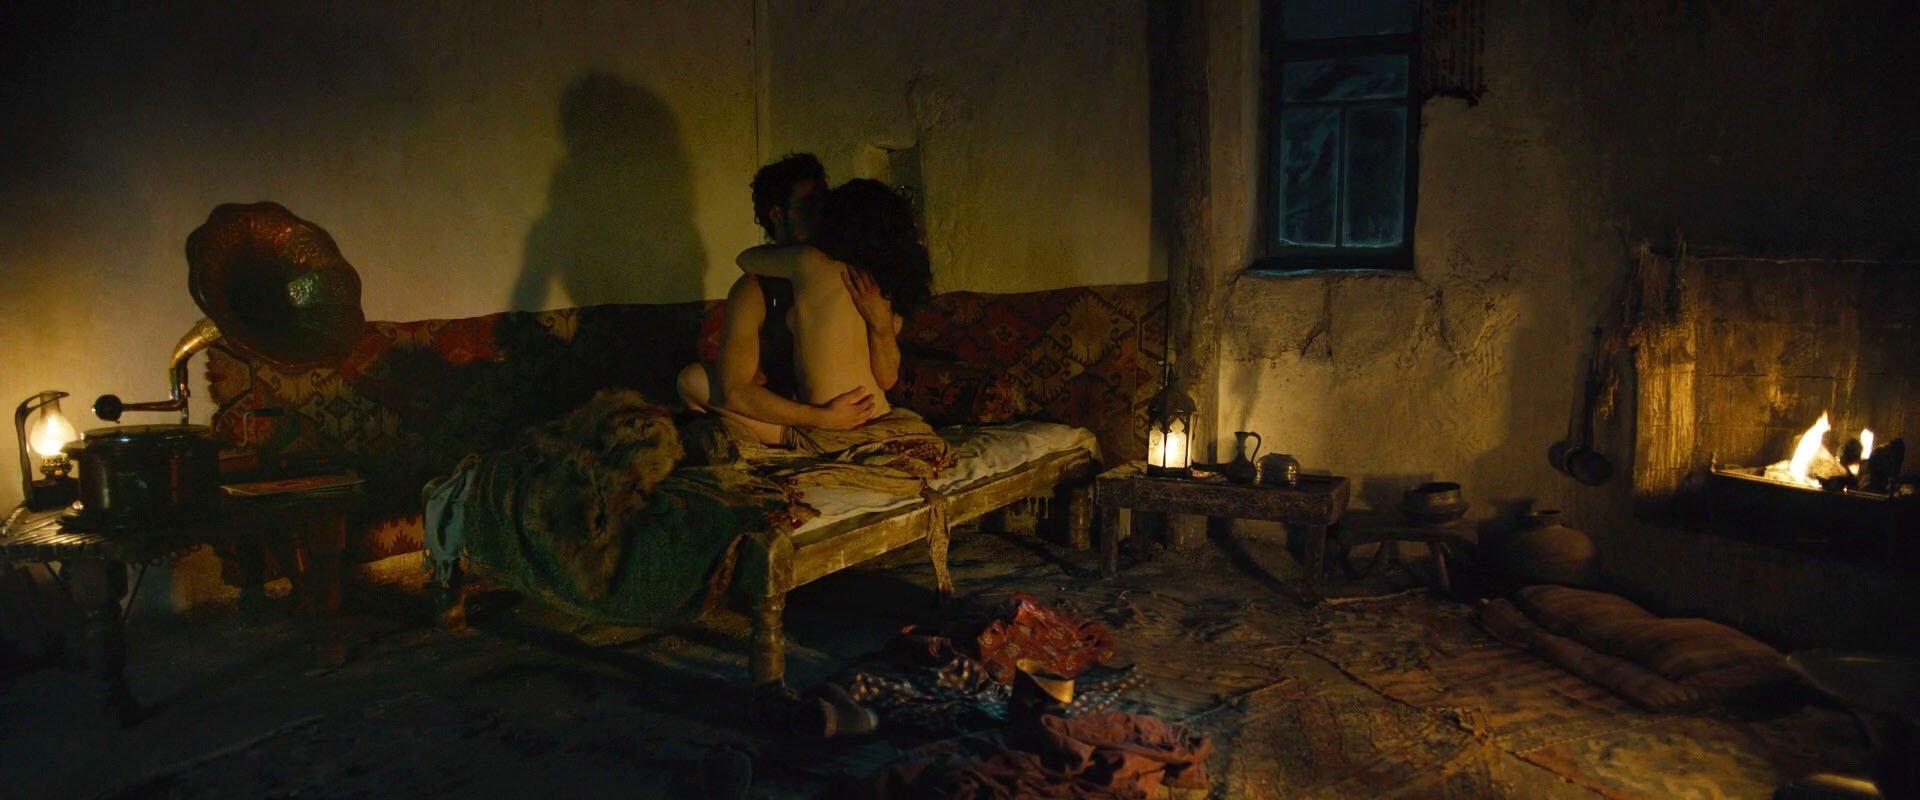 Maria Valverde nude - Ali And Nino (2016)